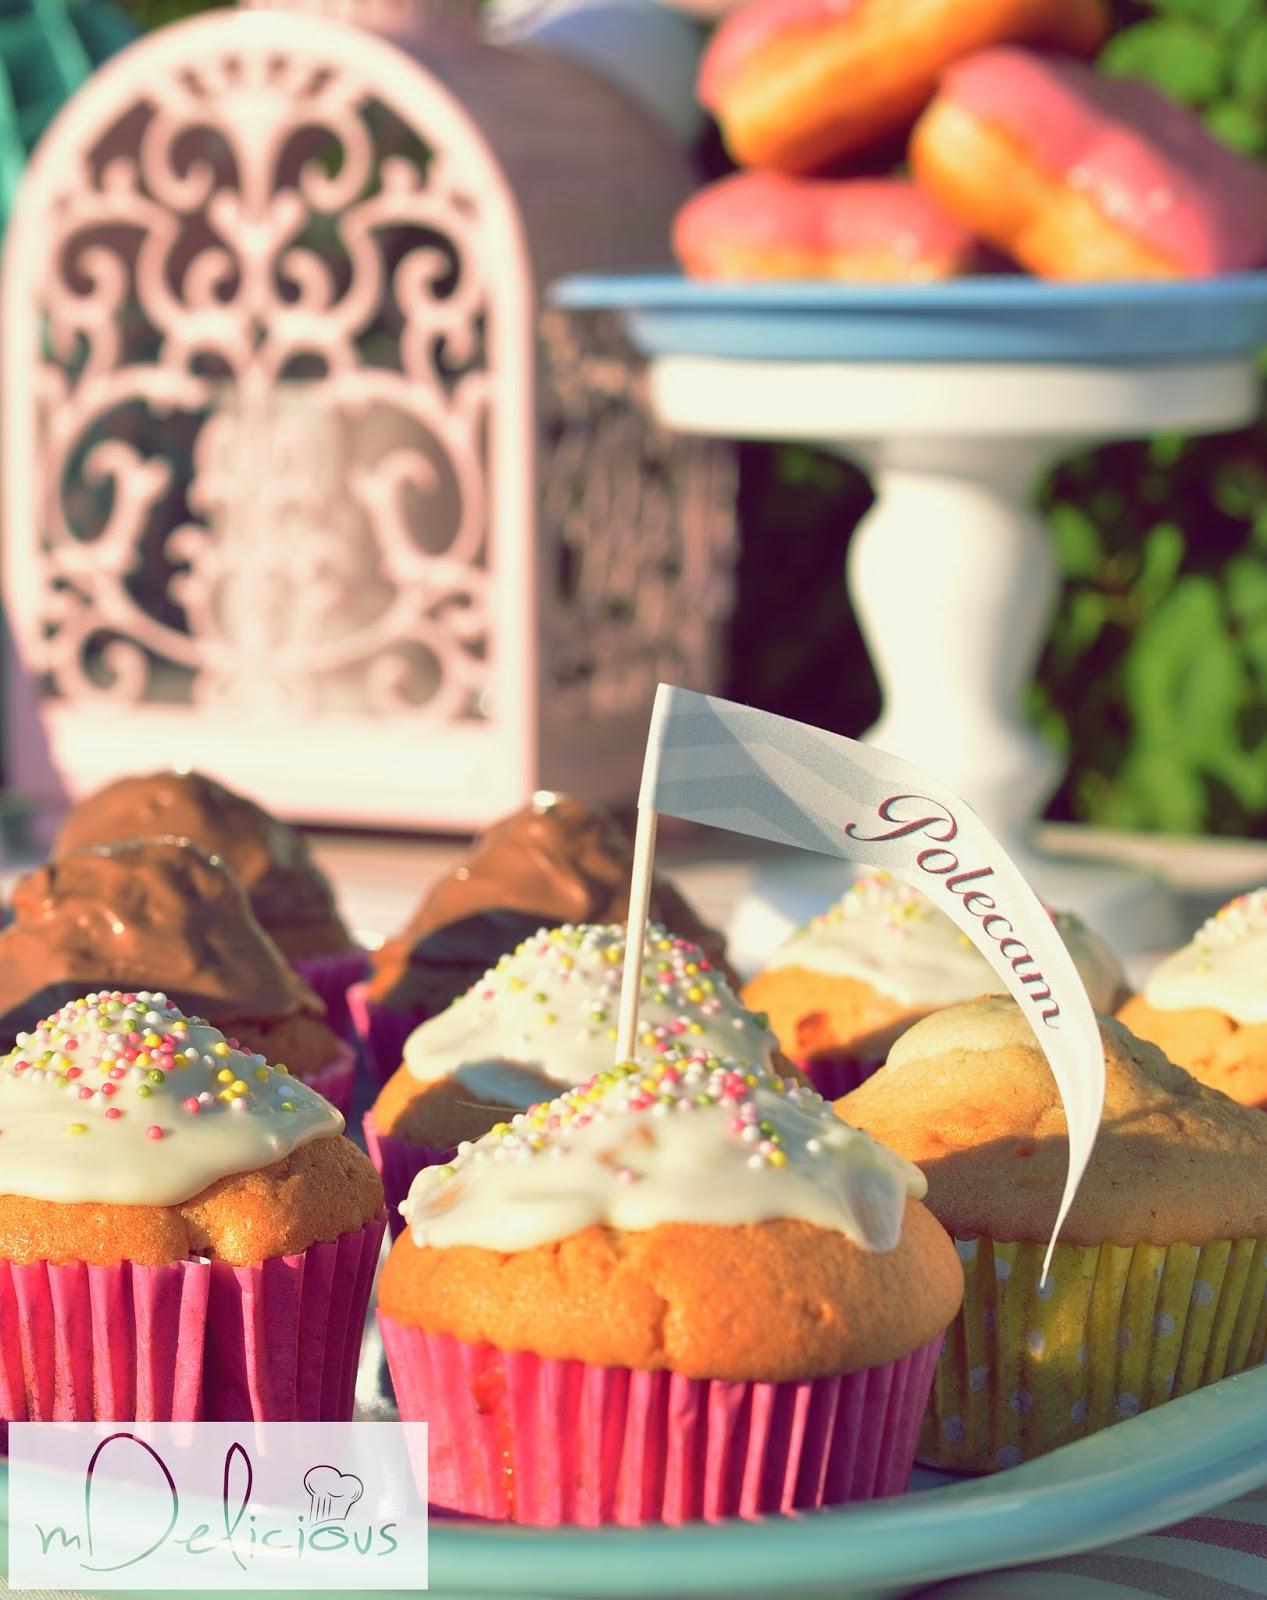 muffinki truskawkowe, muffinki z truskawkami, babeczki truskawkowe, babeczki z truskawkami